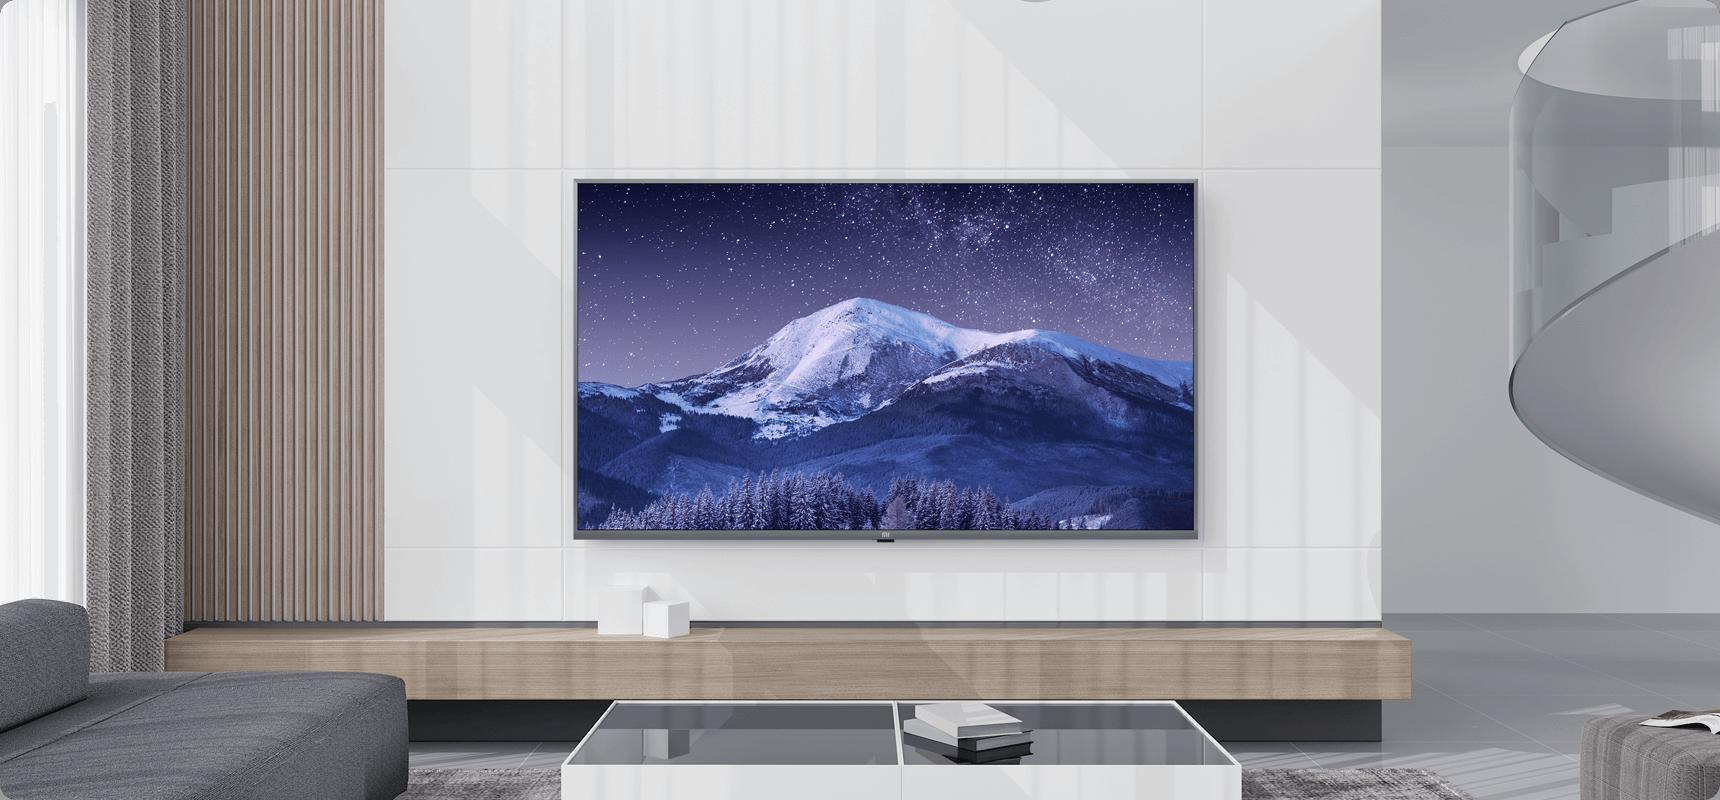 Mi-TV-4X-65-inch-4K-HDR-Smart-TV